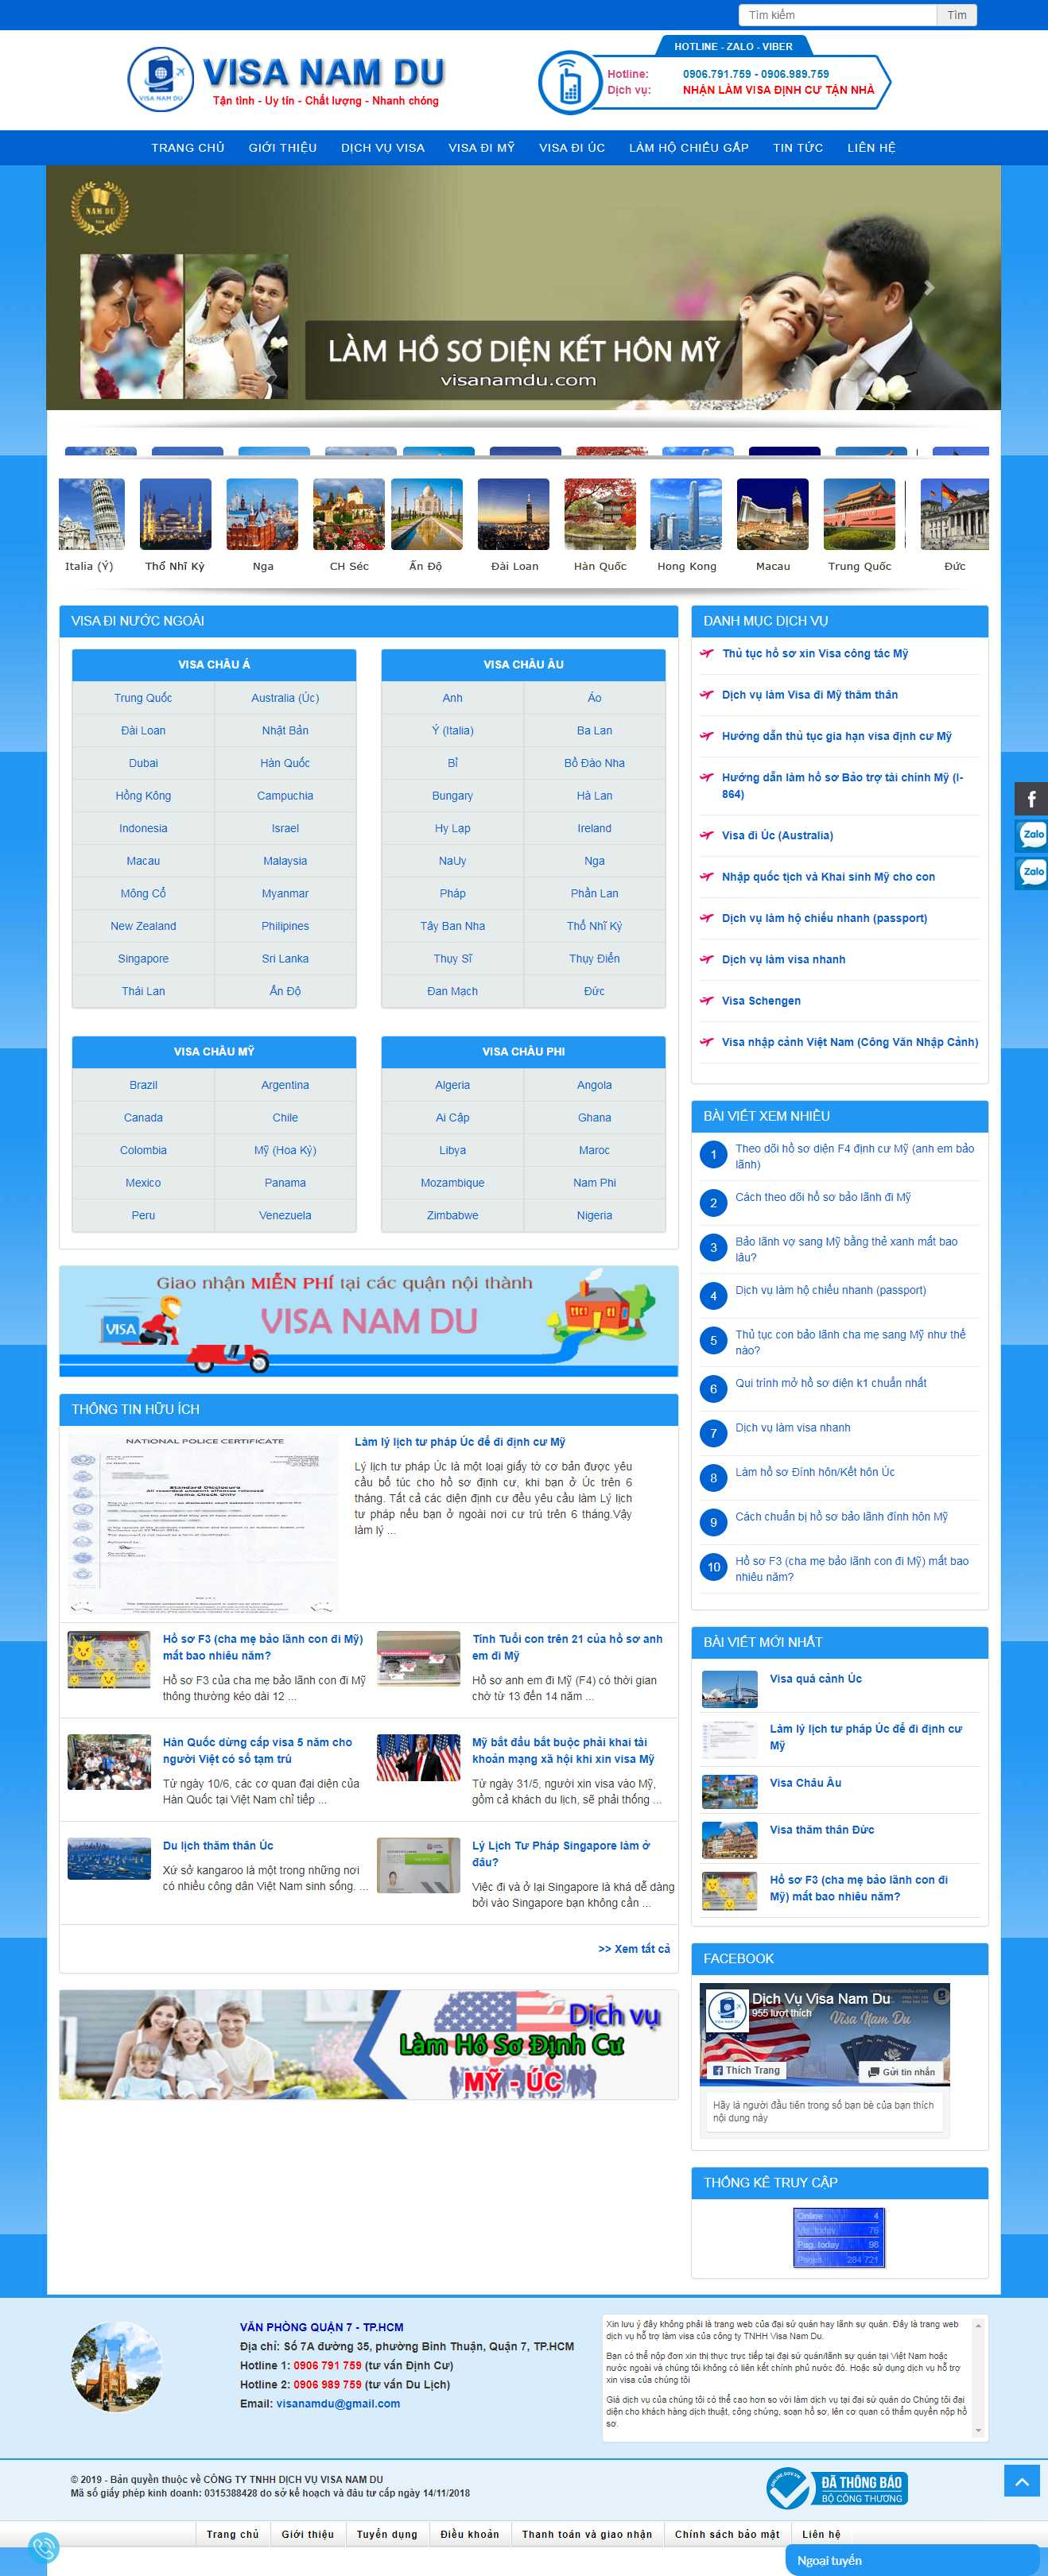 Thiết kế web dịch vụ visa - www.visanamdu.com